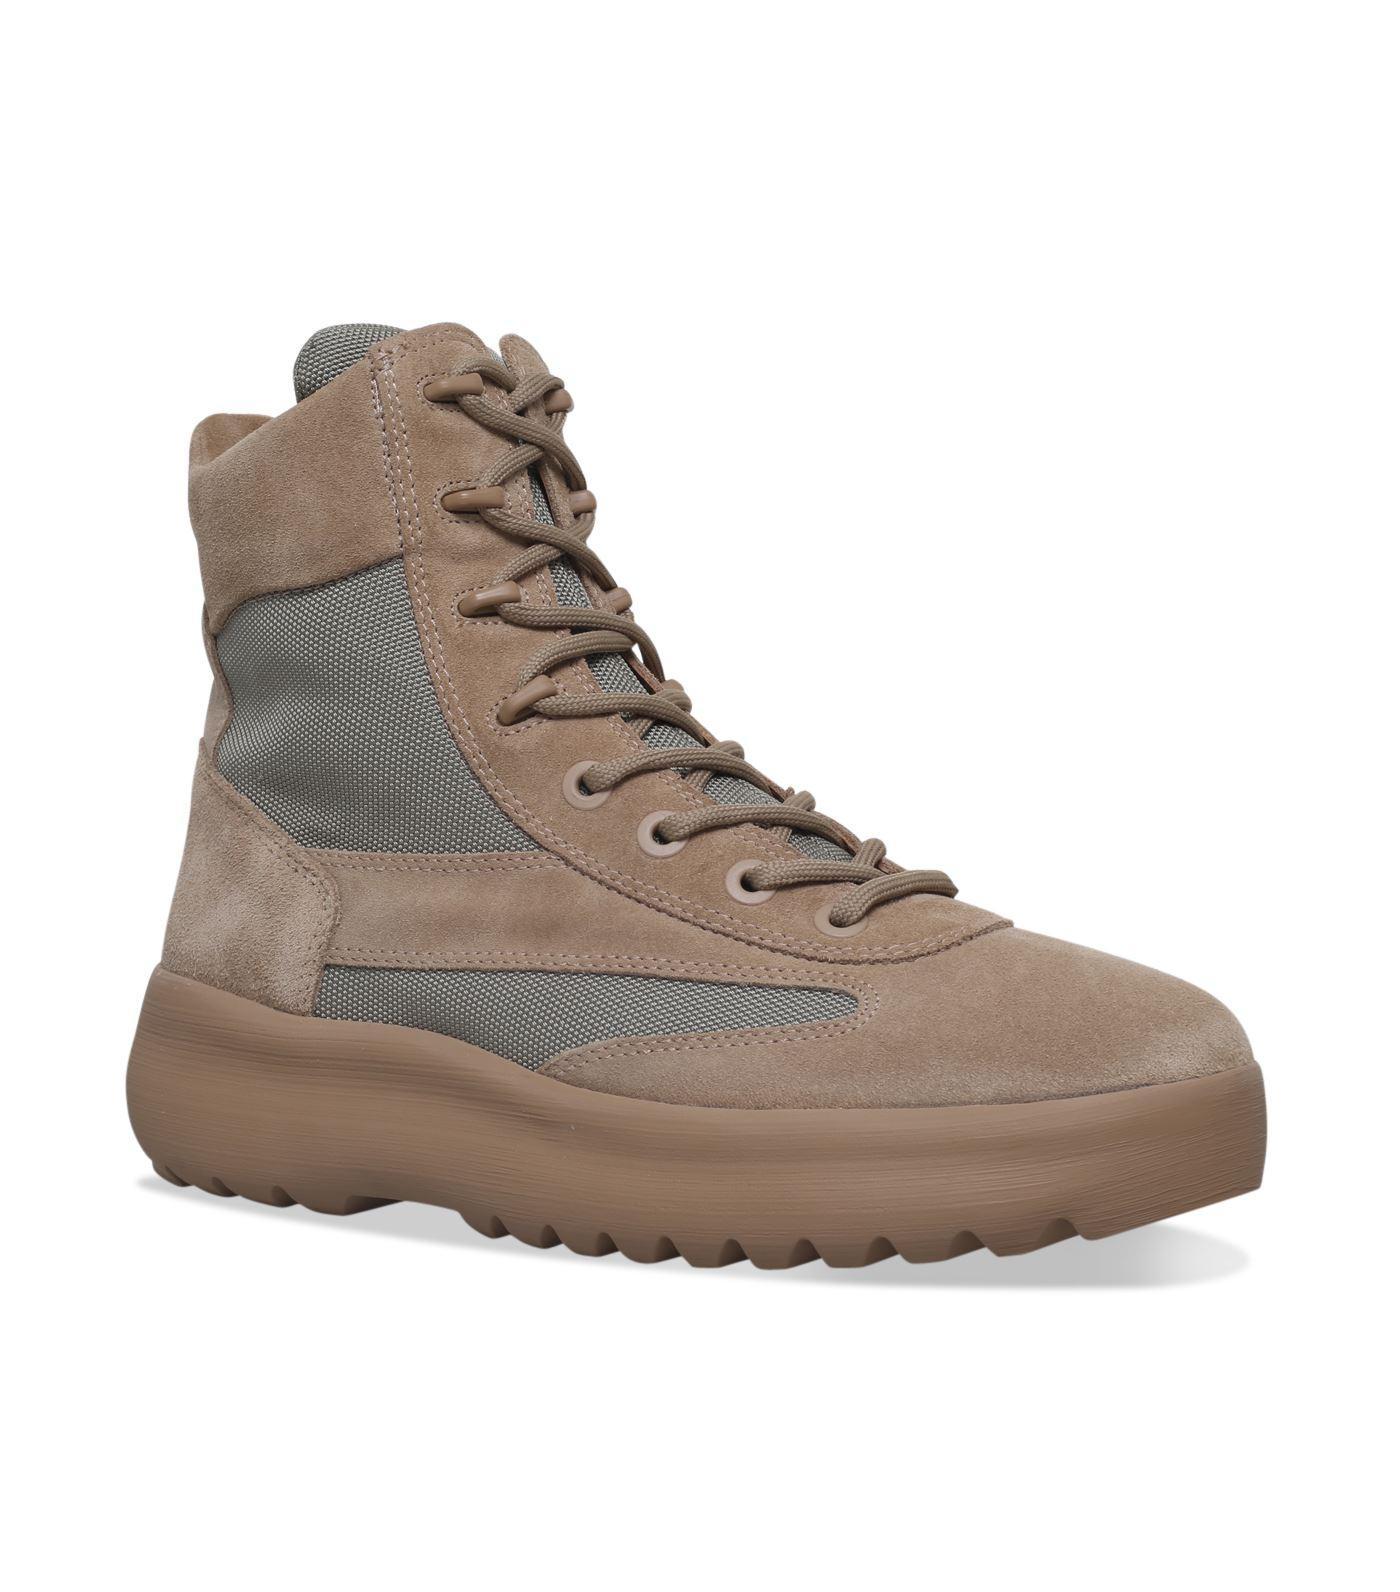 Yeezy Suede Military Boot In Beige